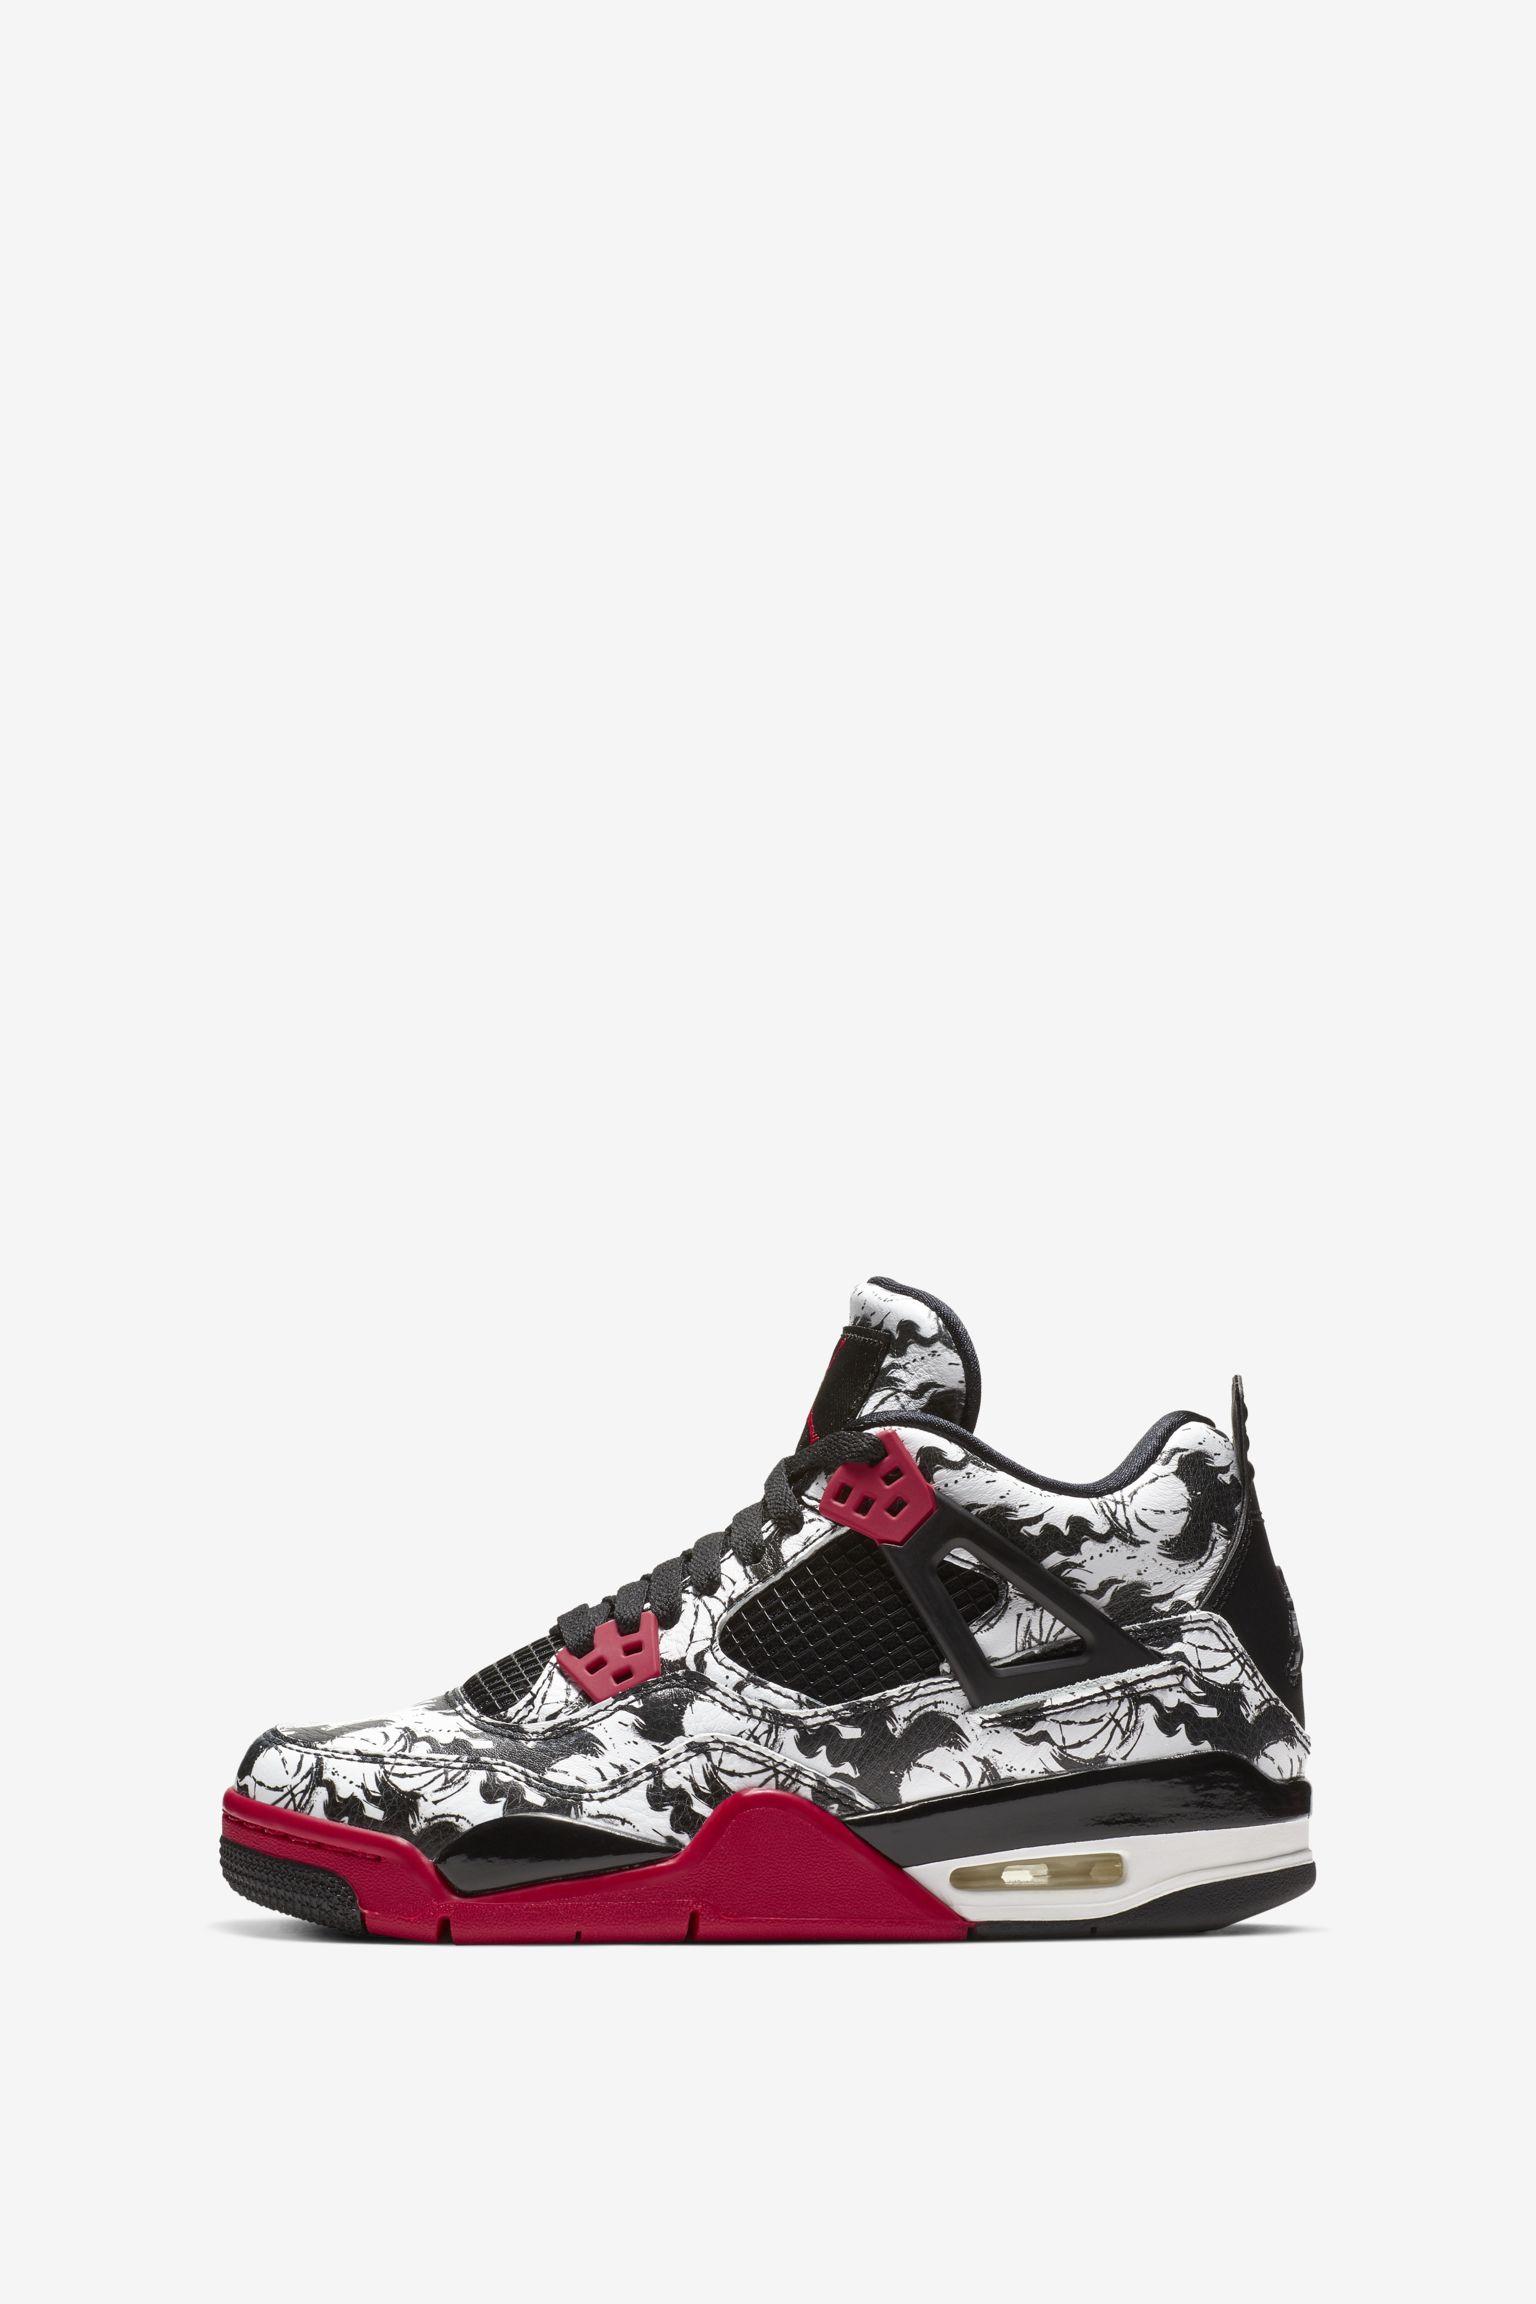 Air Jordan 4 Retro 'Singles Day 2018' Release Day